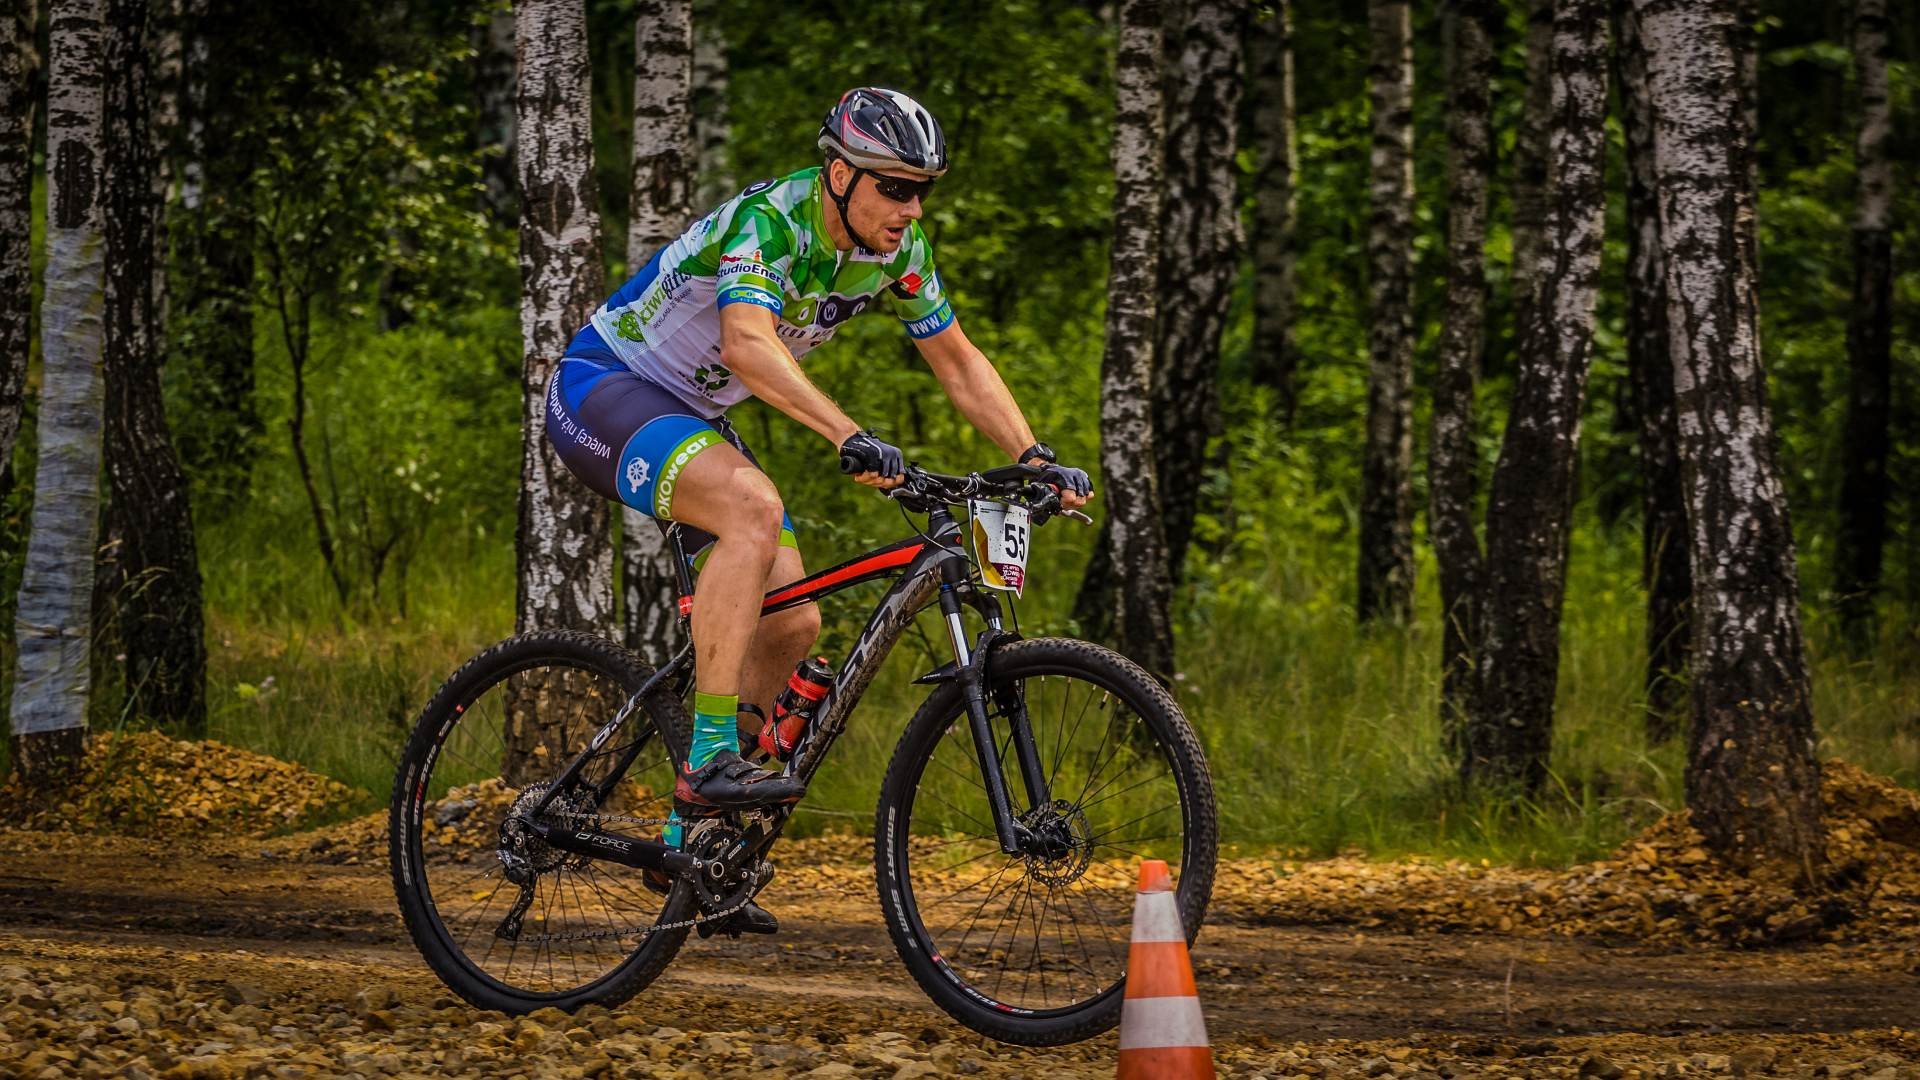 wyscig-rowerow-gorskich-0138